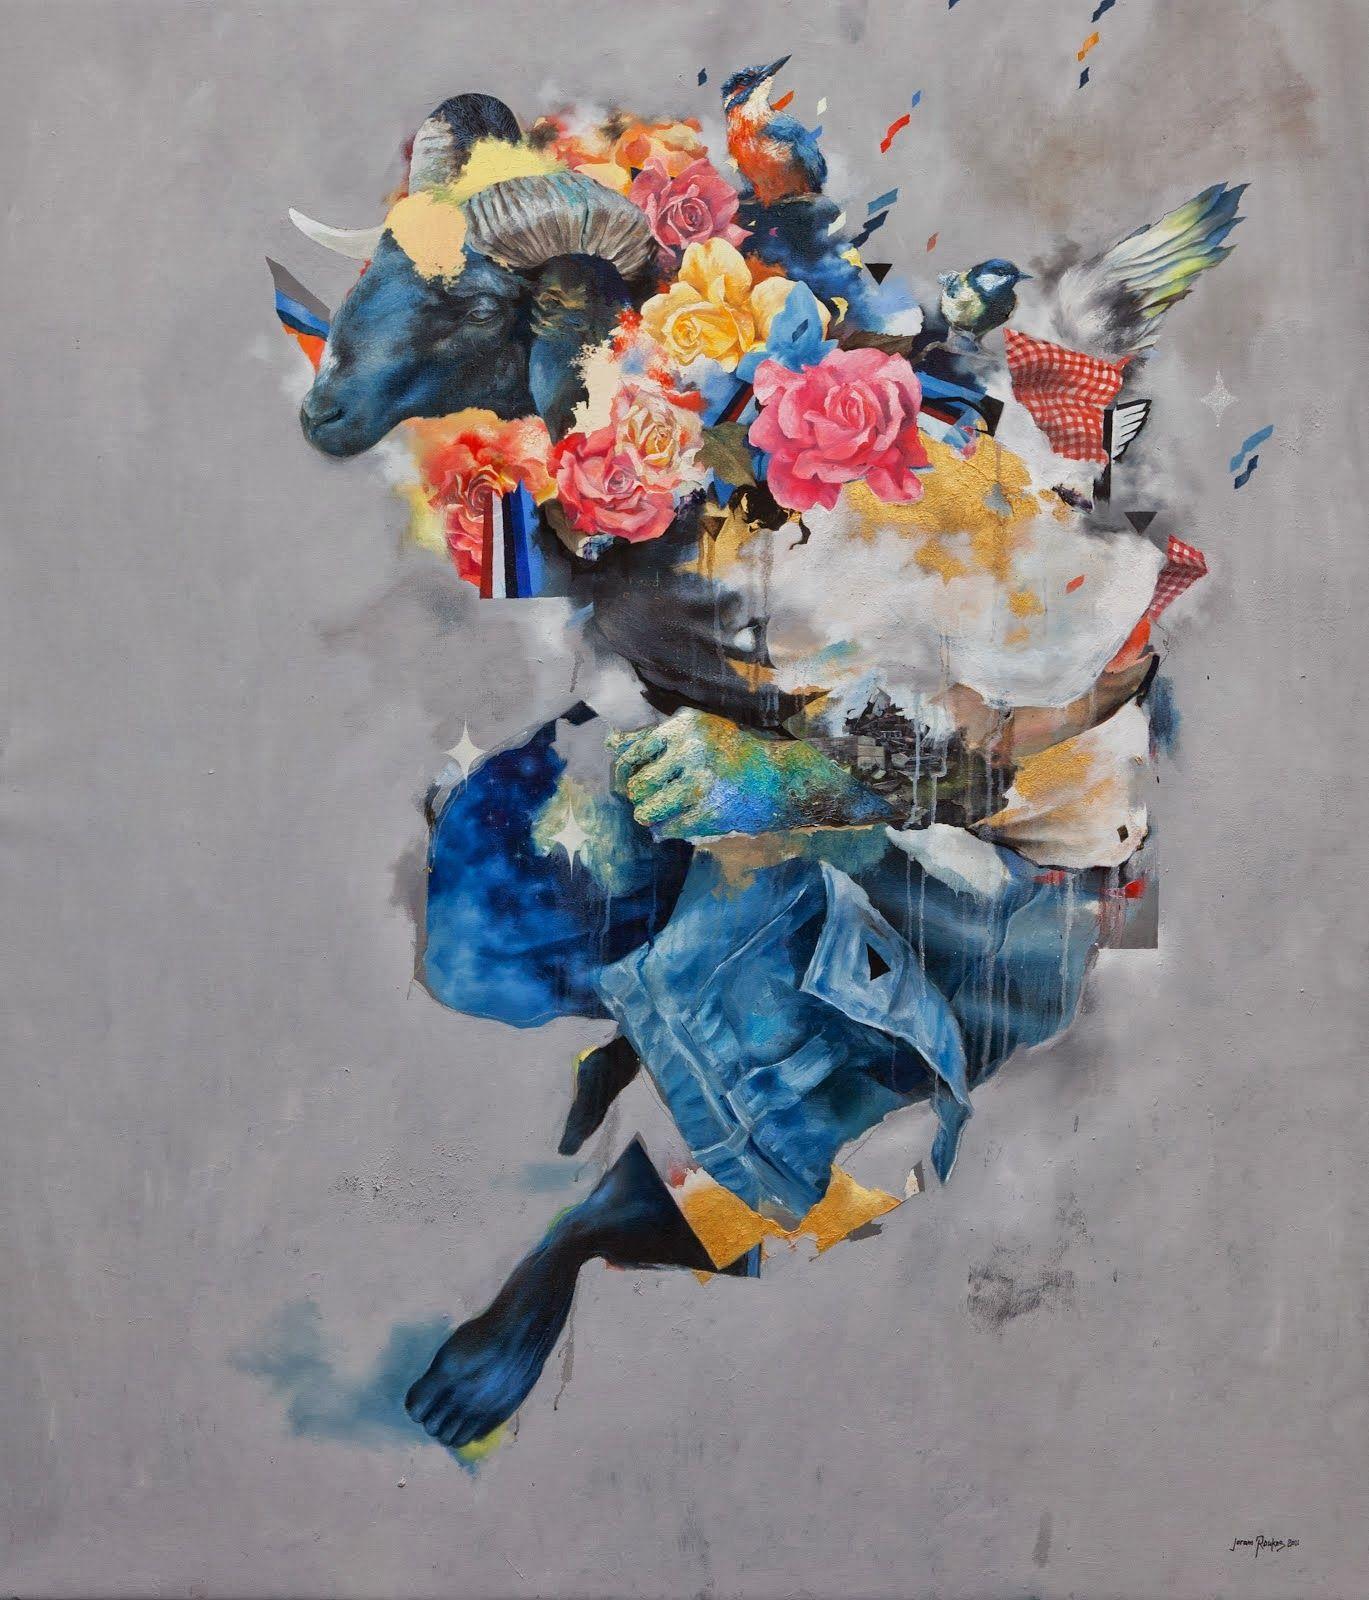 Artodyssey: Joram Roukes